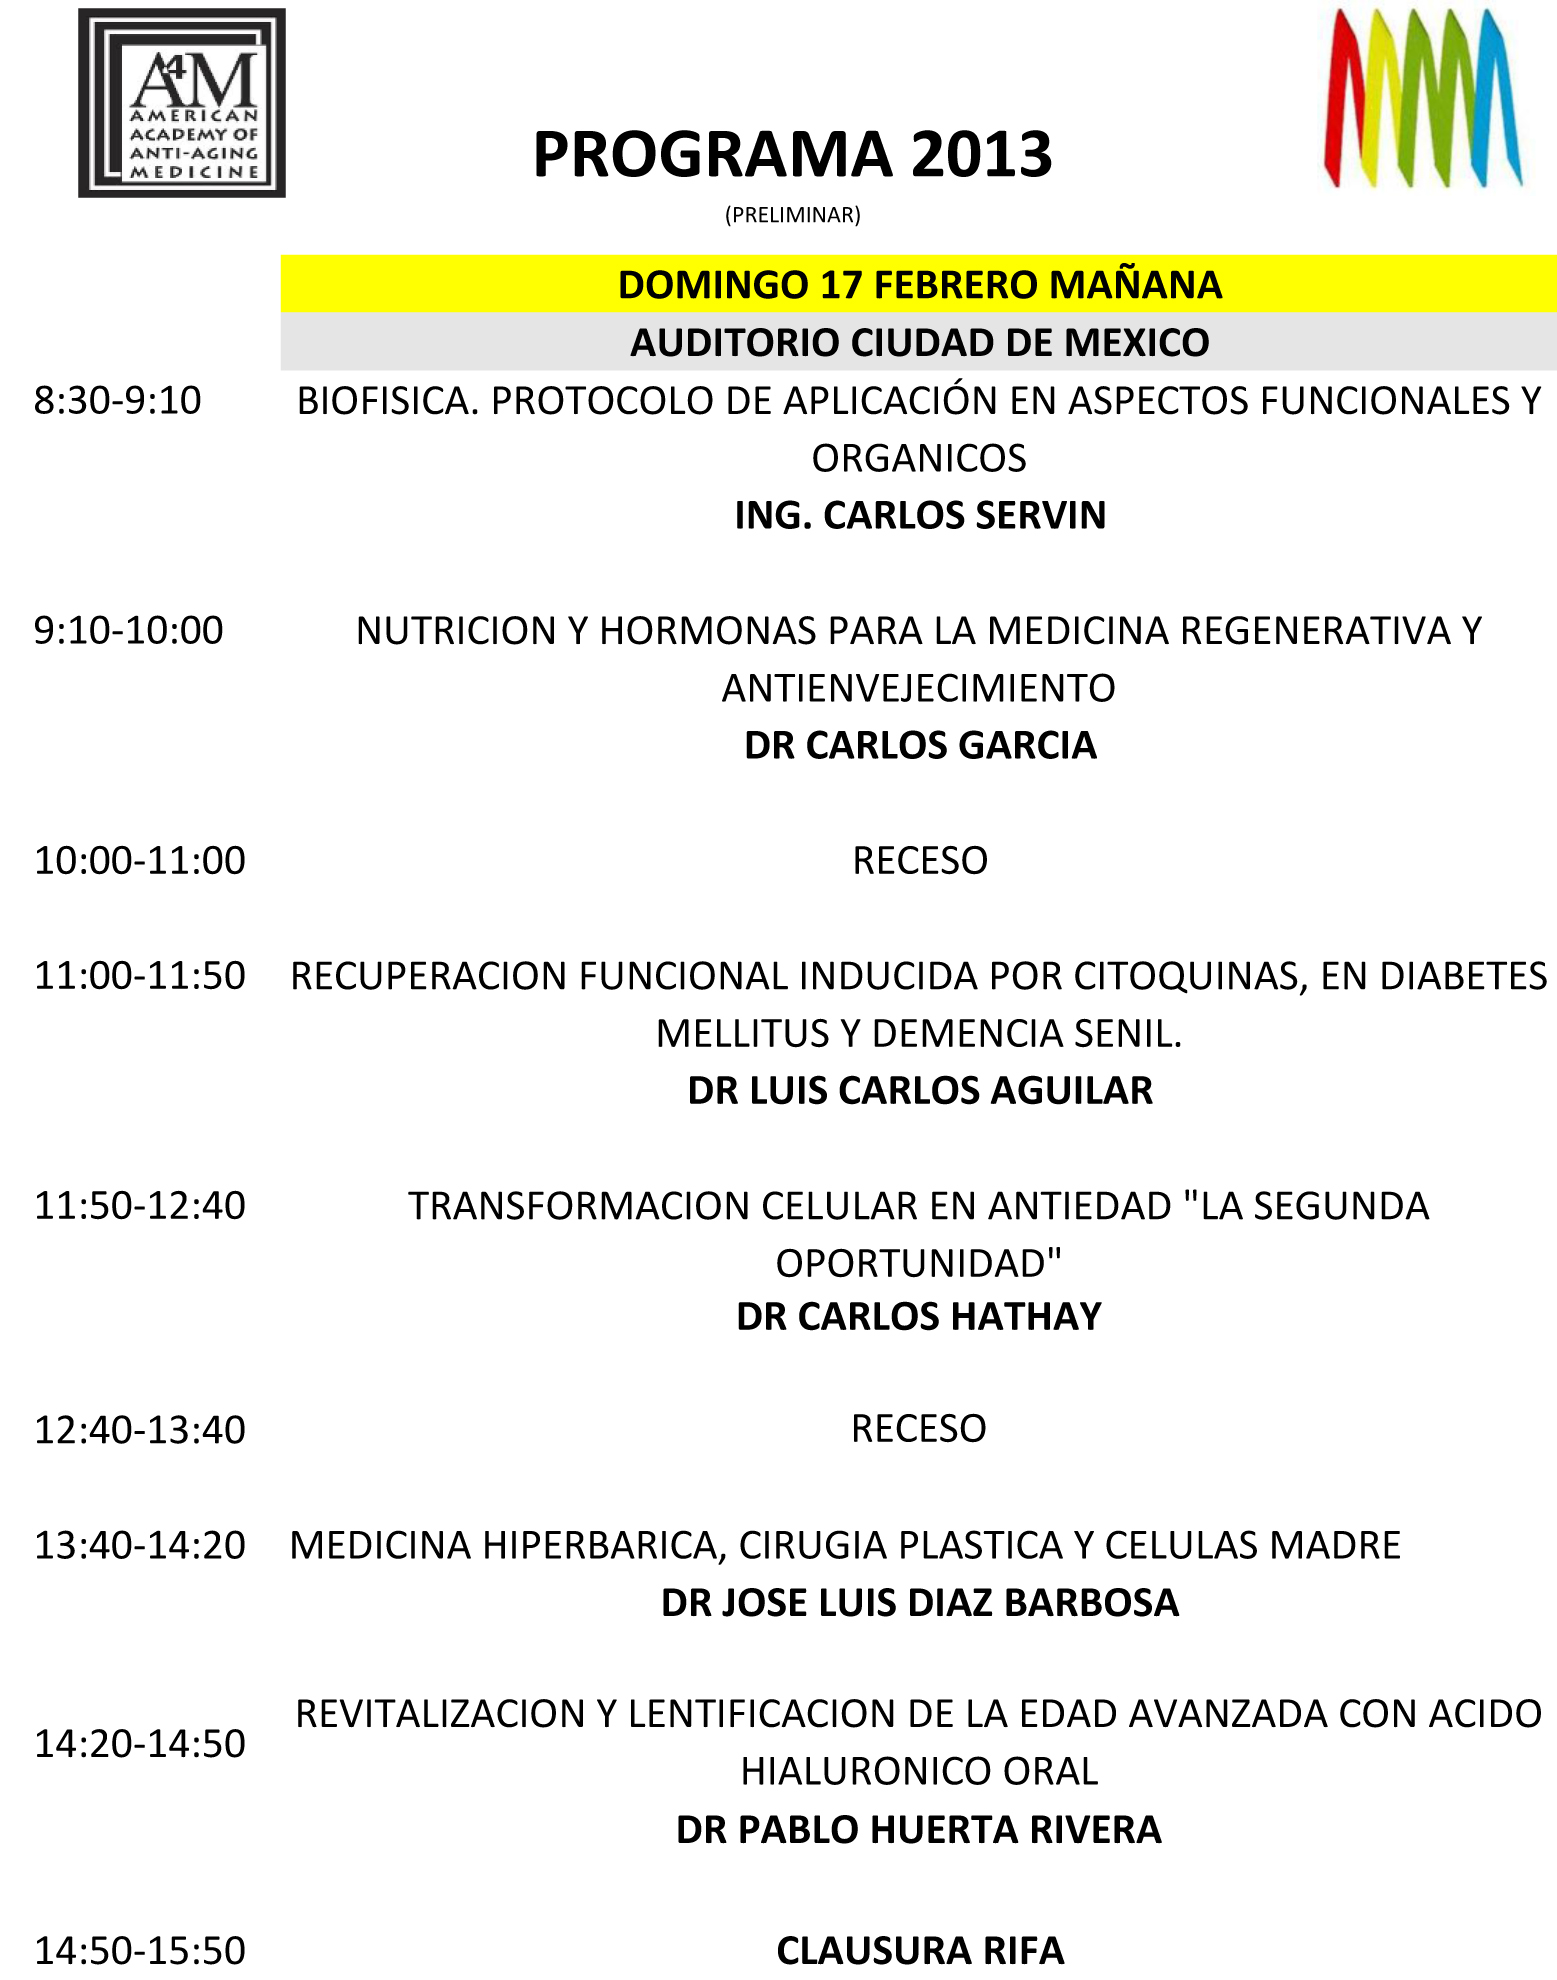 2013-PROGRAMA-DOMINGO